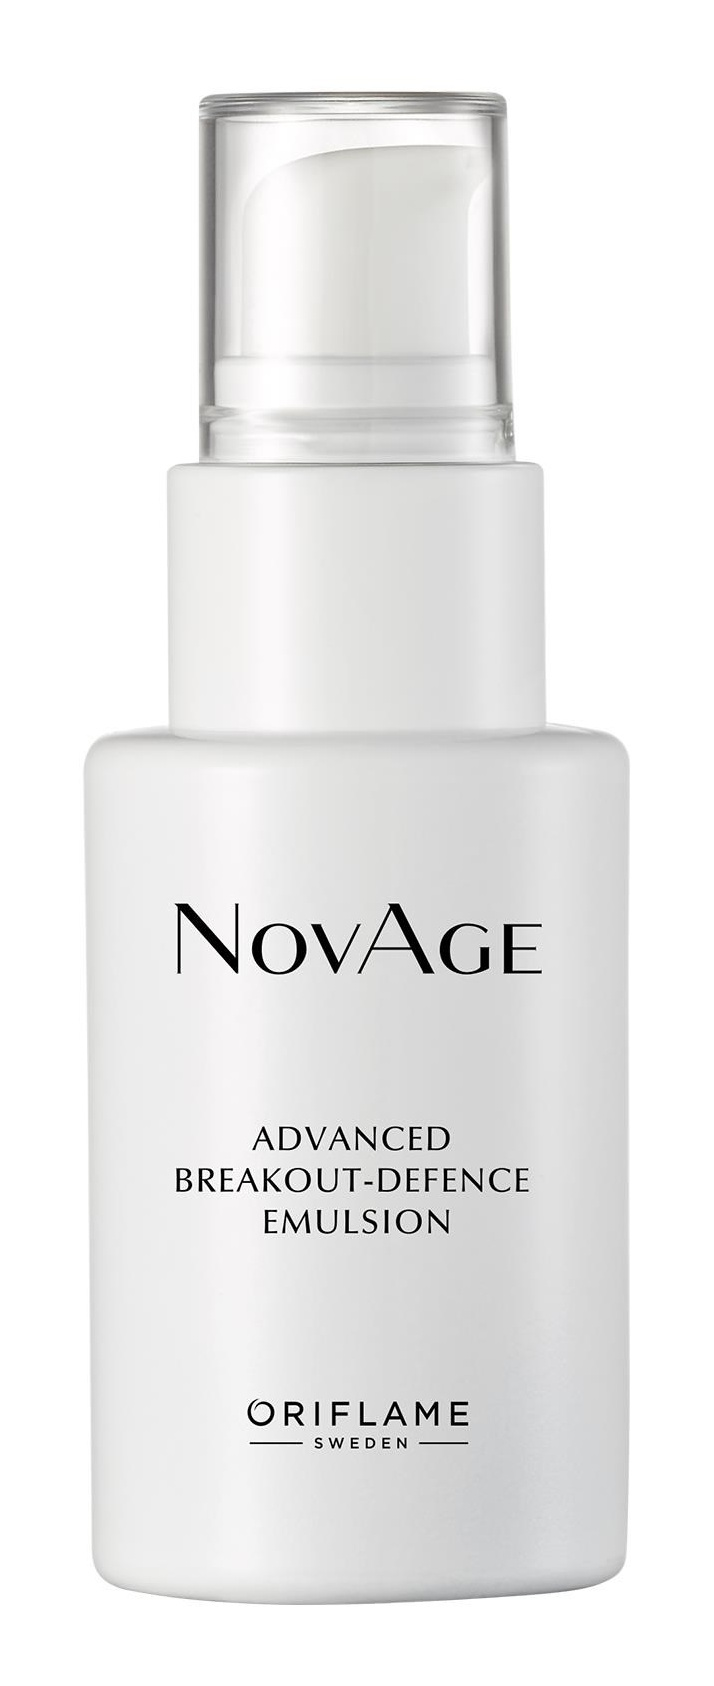 NovAge Advanced Breakout-Defence Emulsion